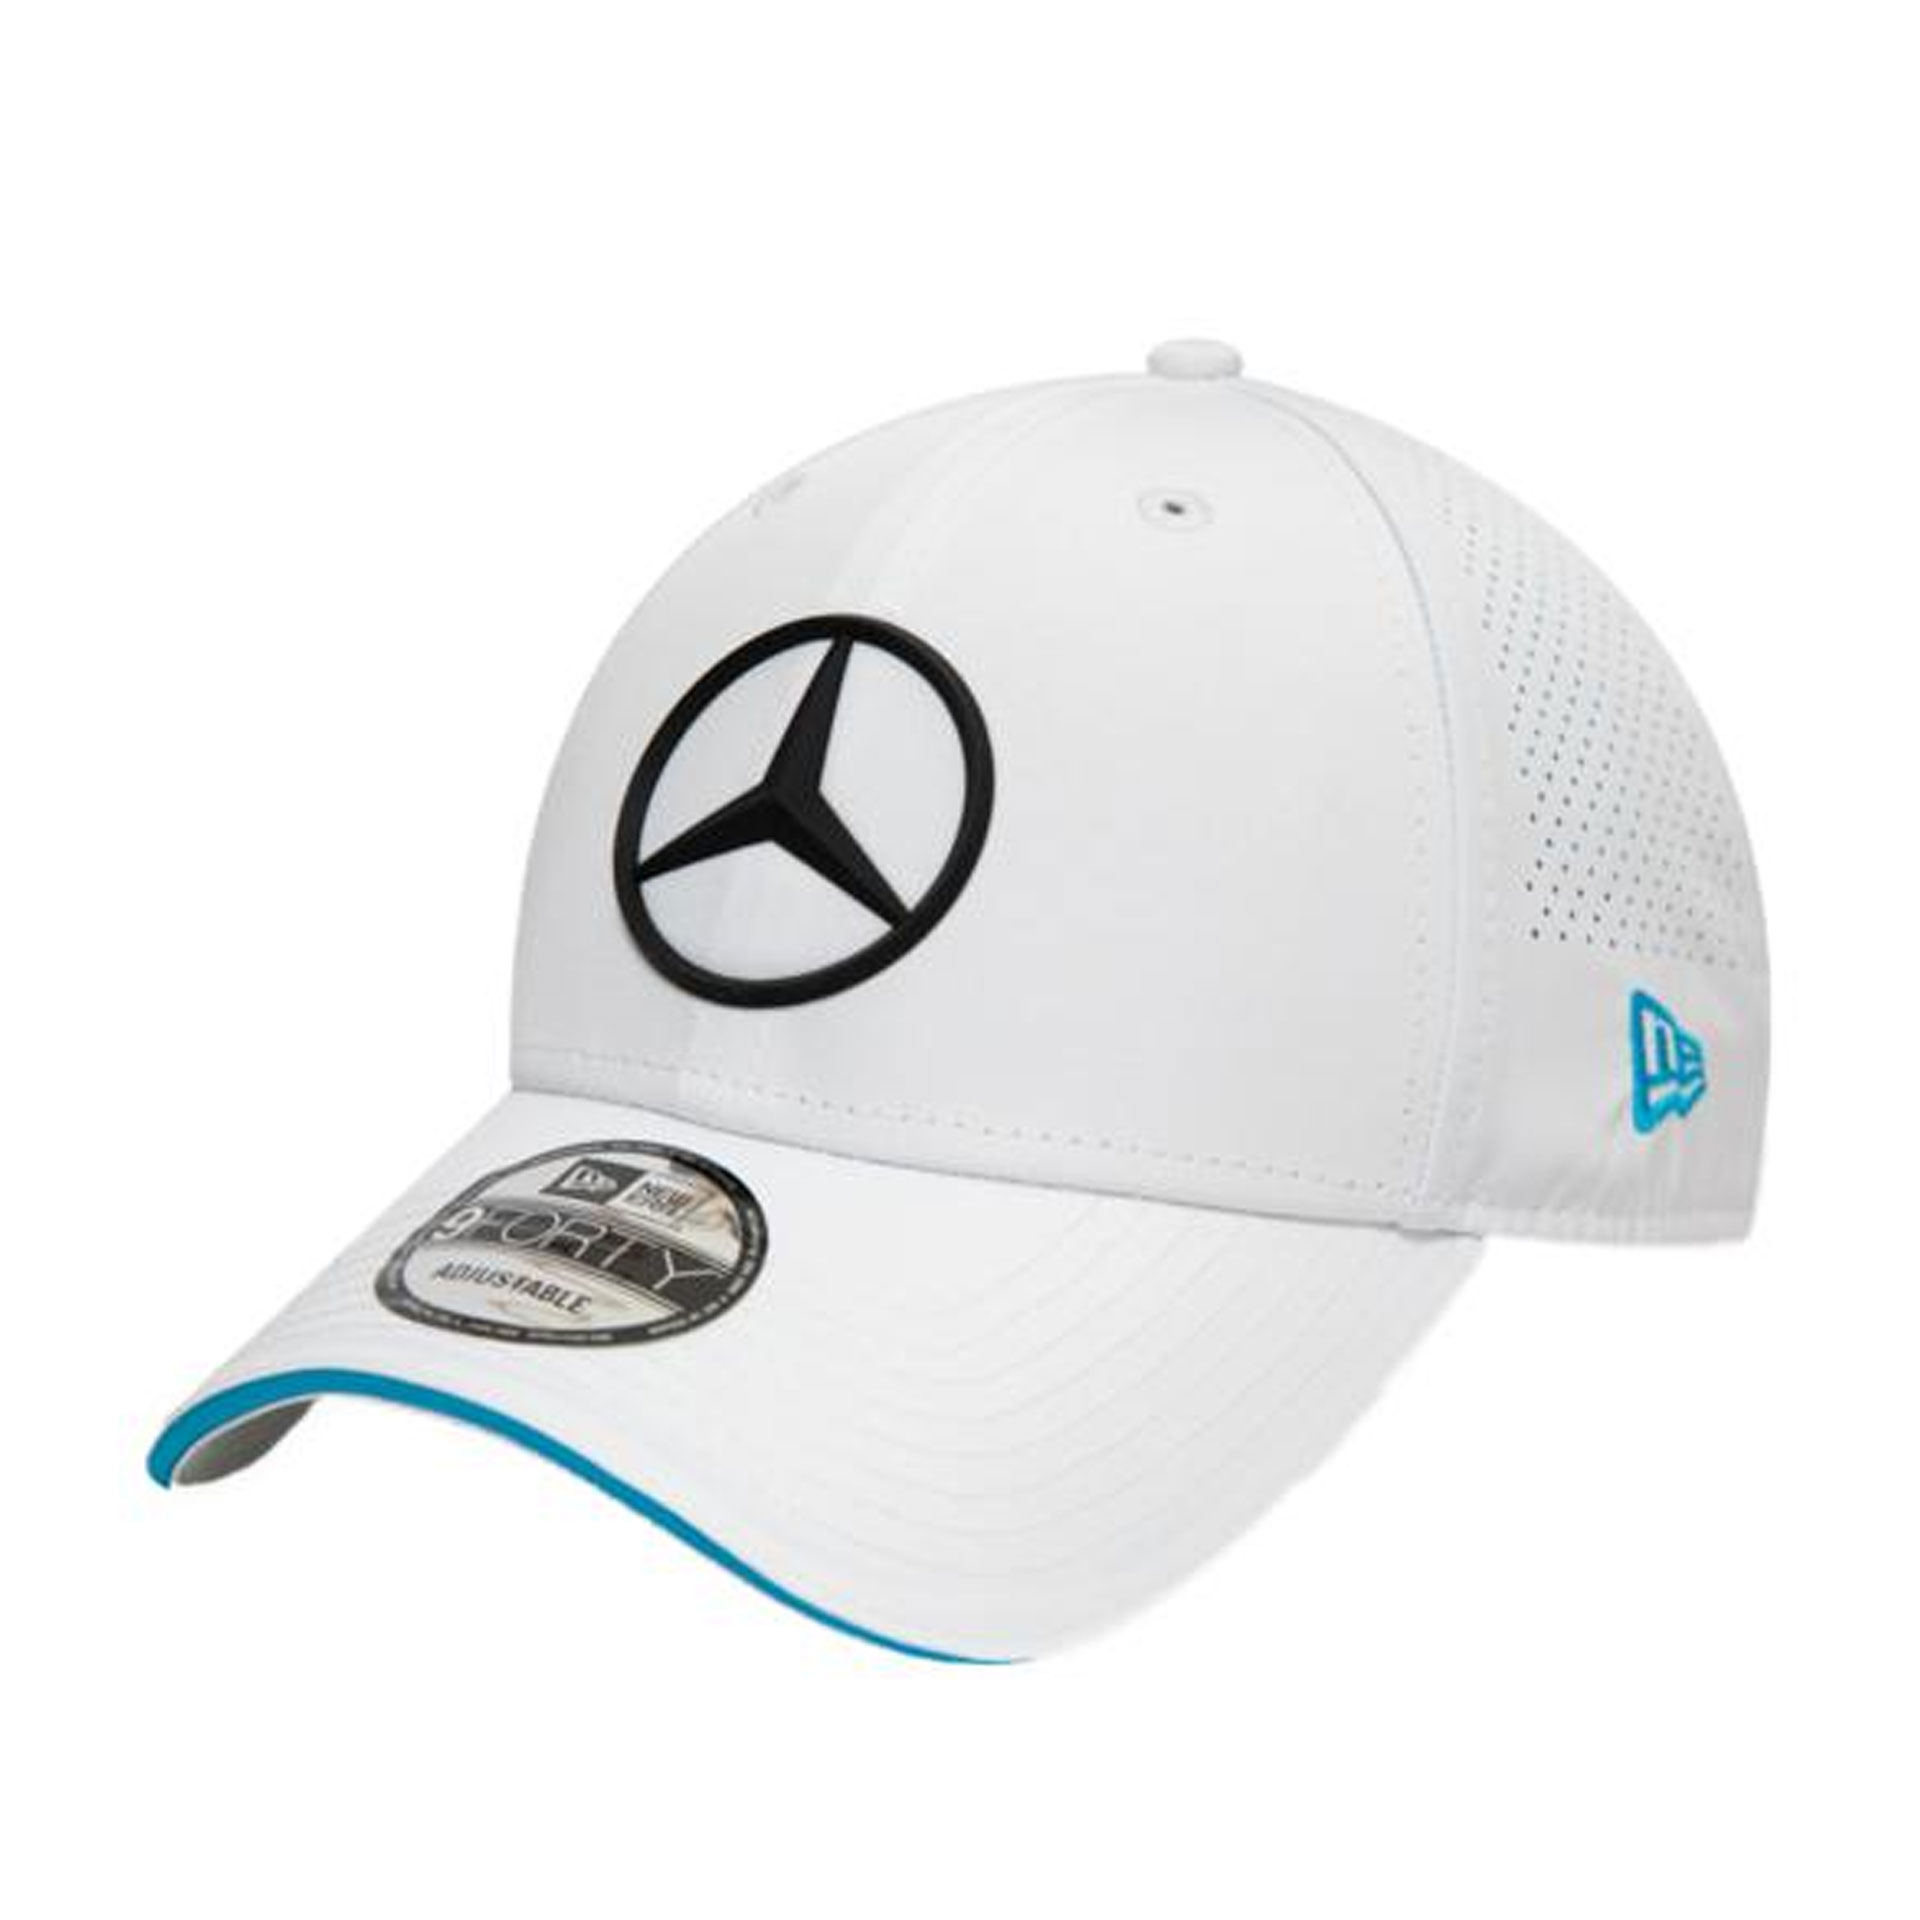 Mercedes-Benz Formel E Cap Kappe Basecap Weiß